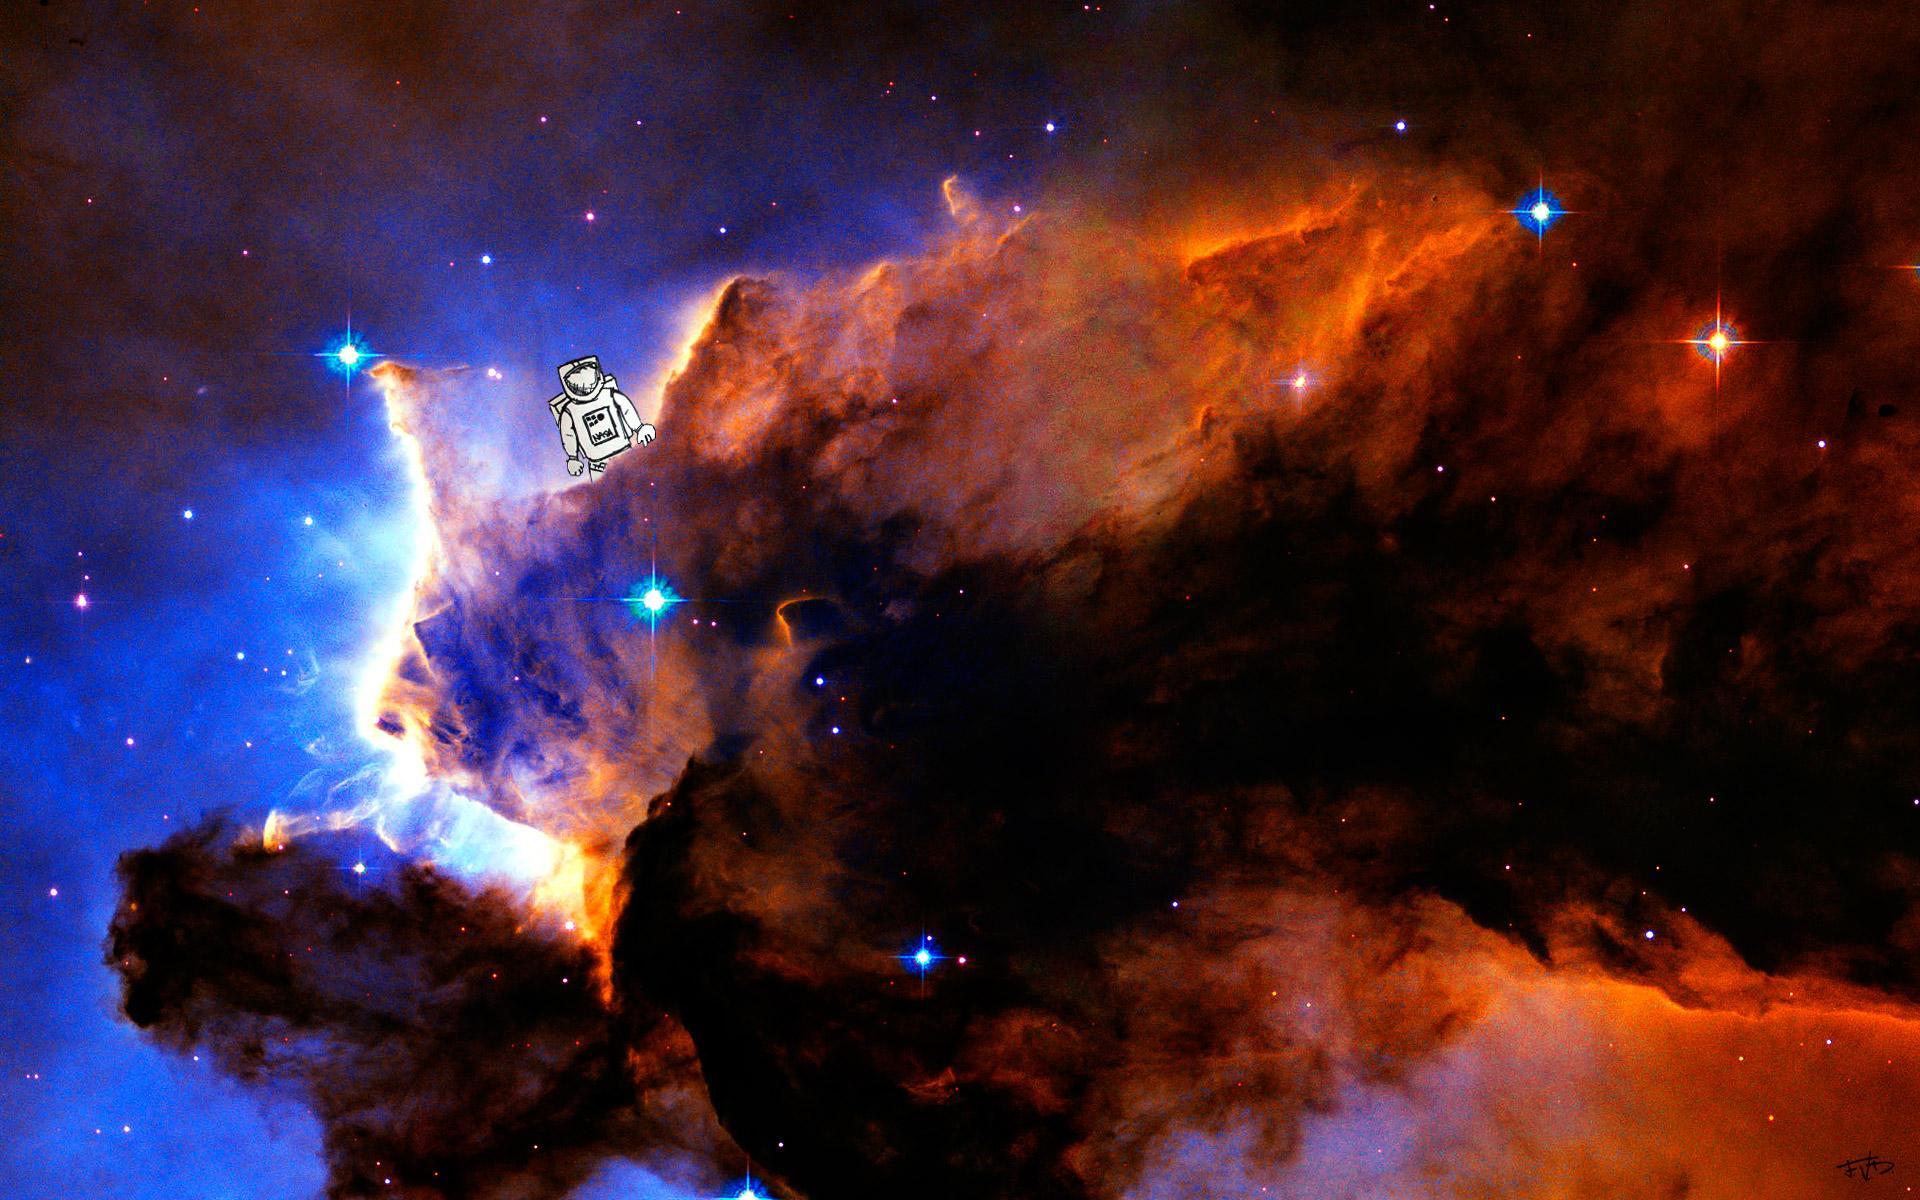 Hubble Telescope Francis Delapena 1920x1200